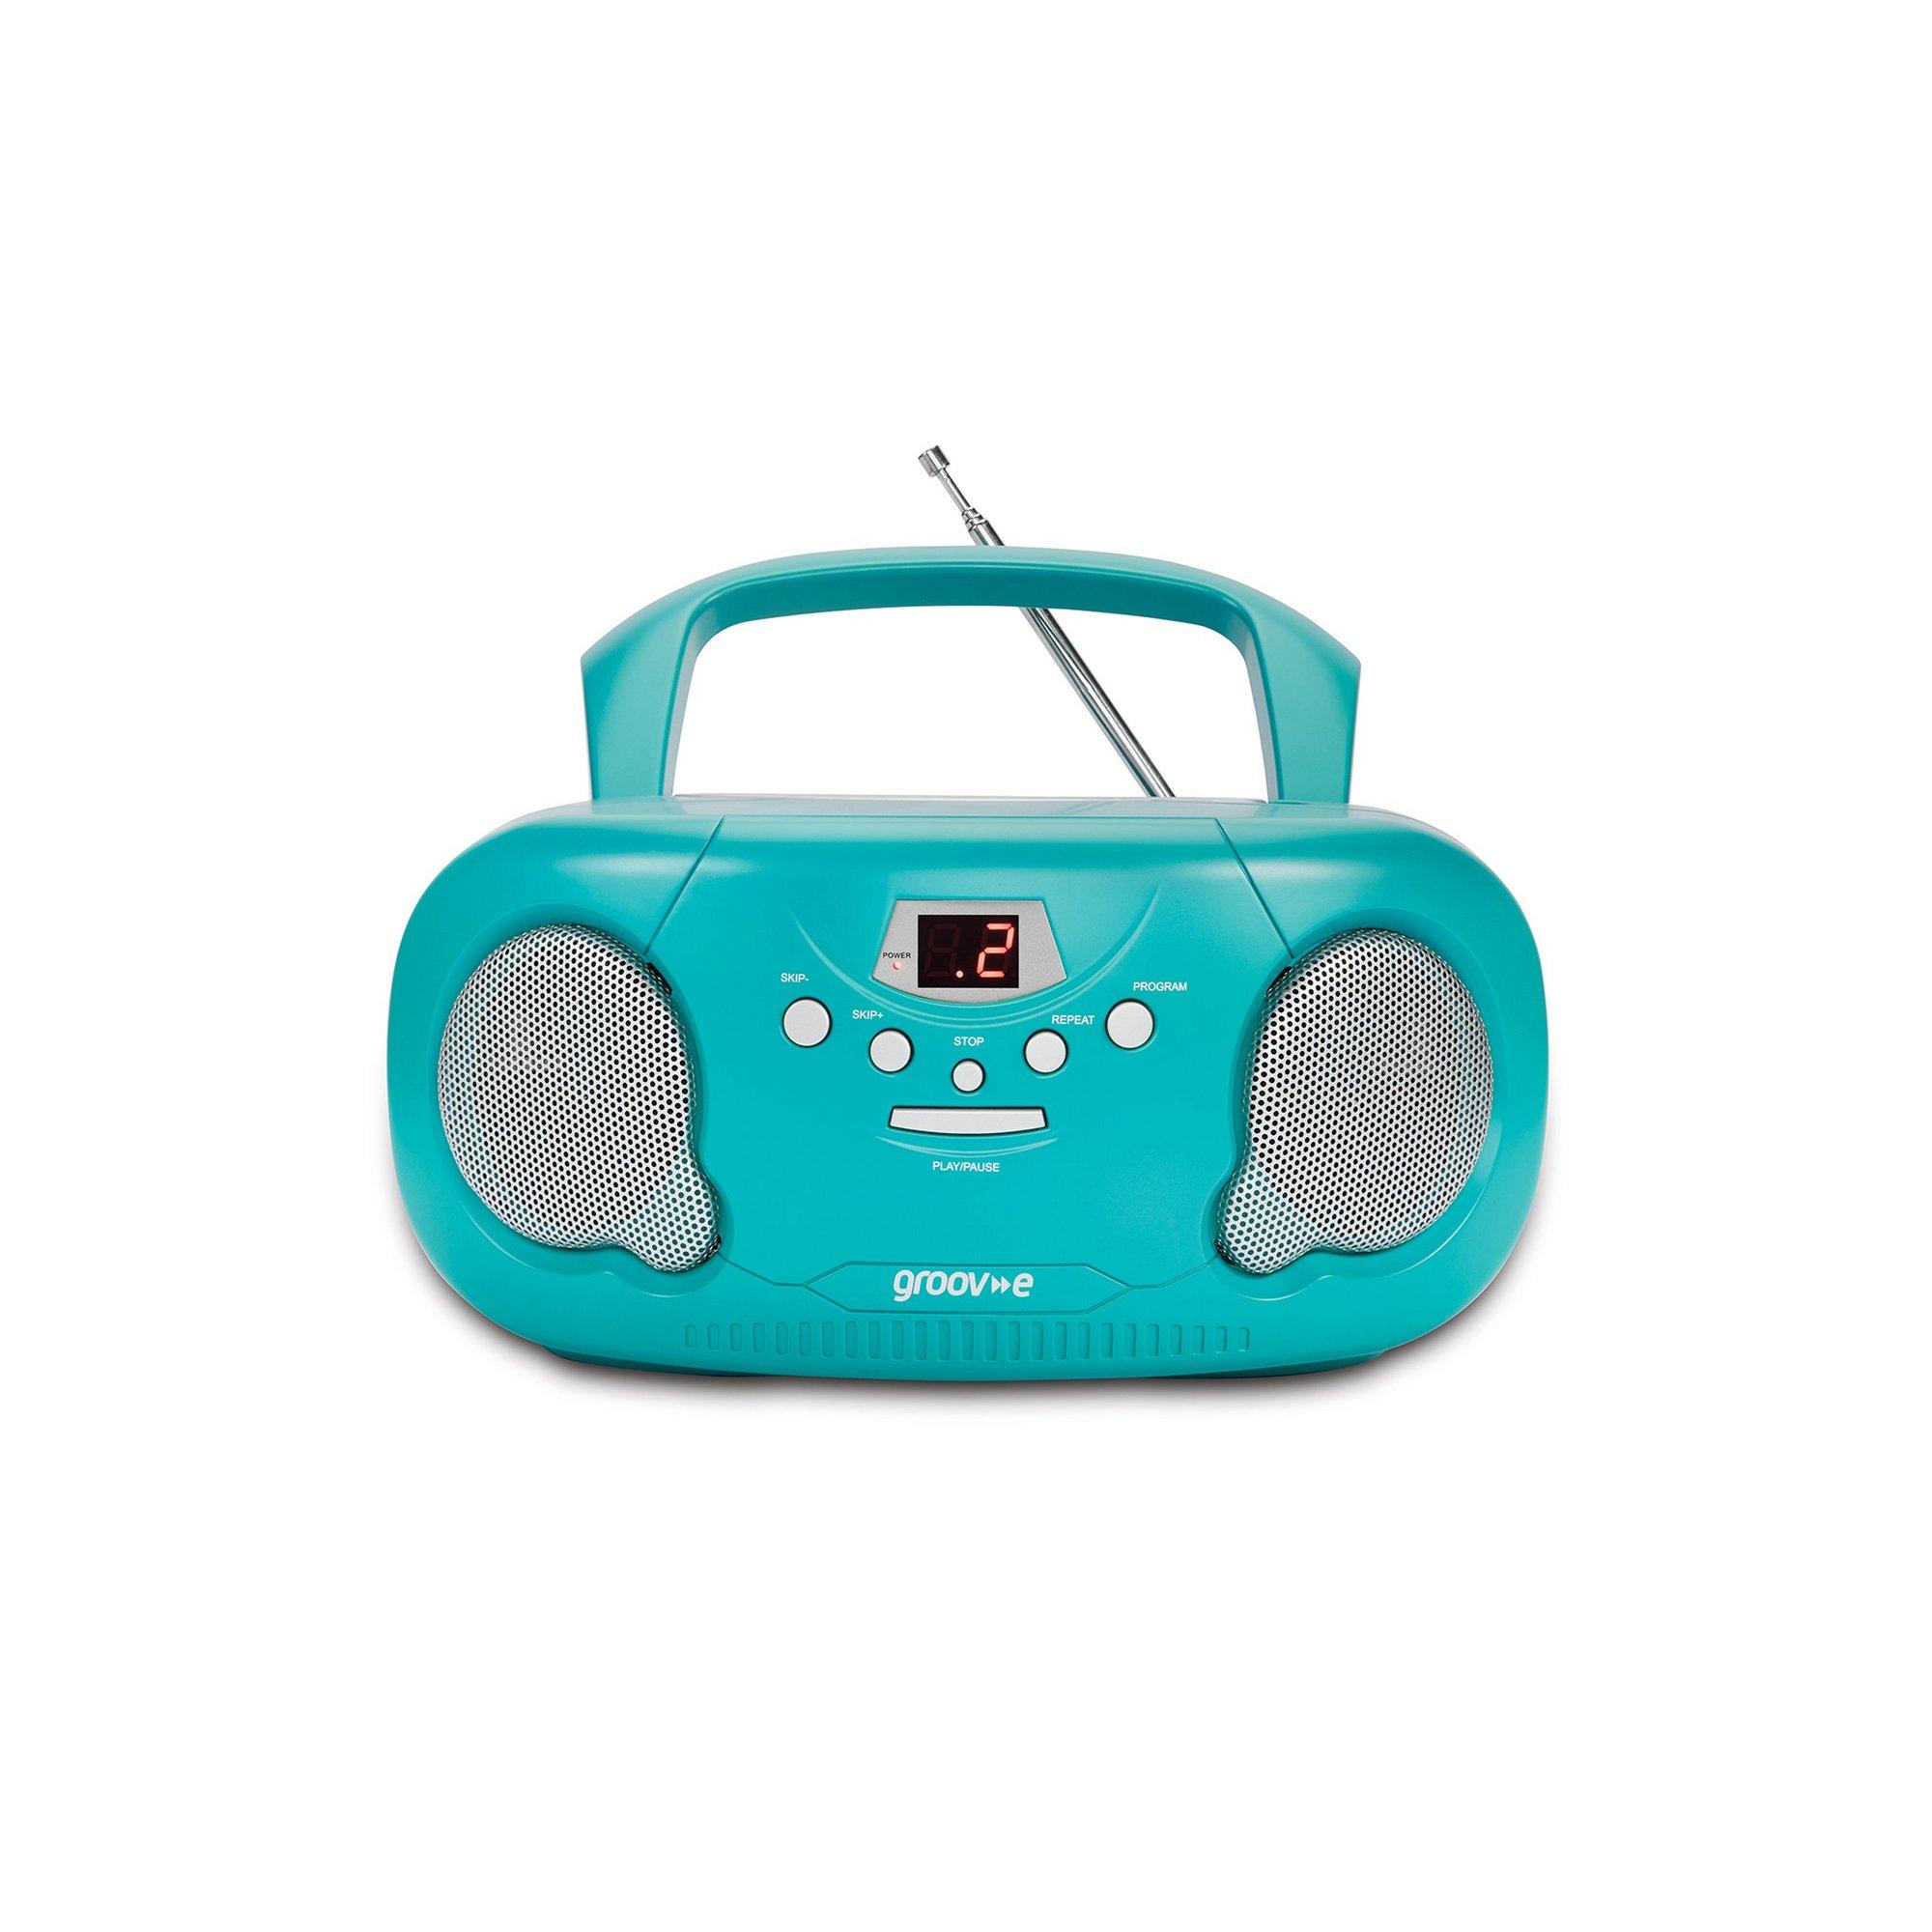 Image of Groov-e Original Boombox with Radio